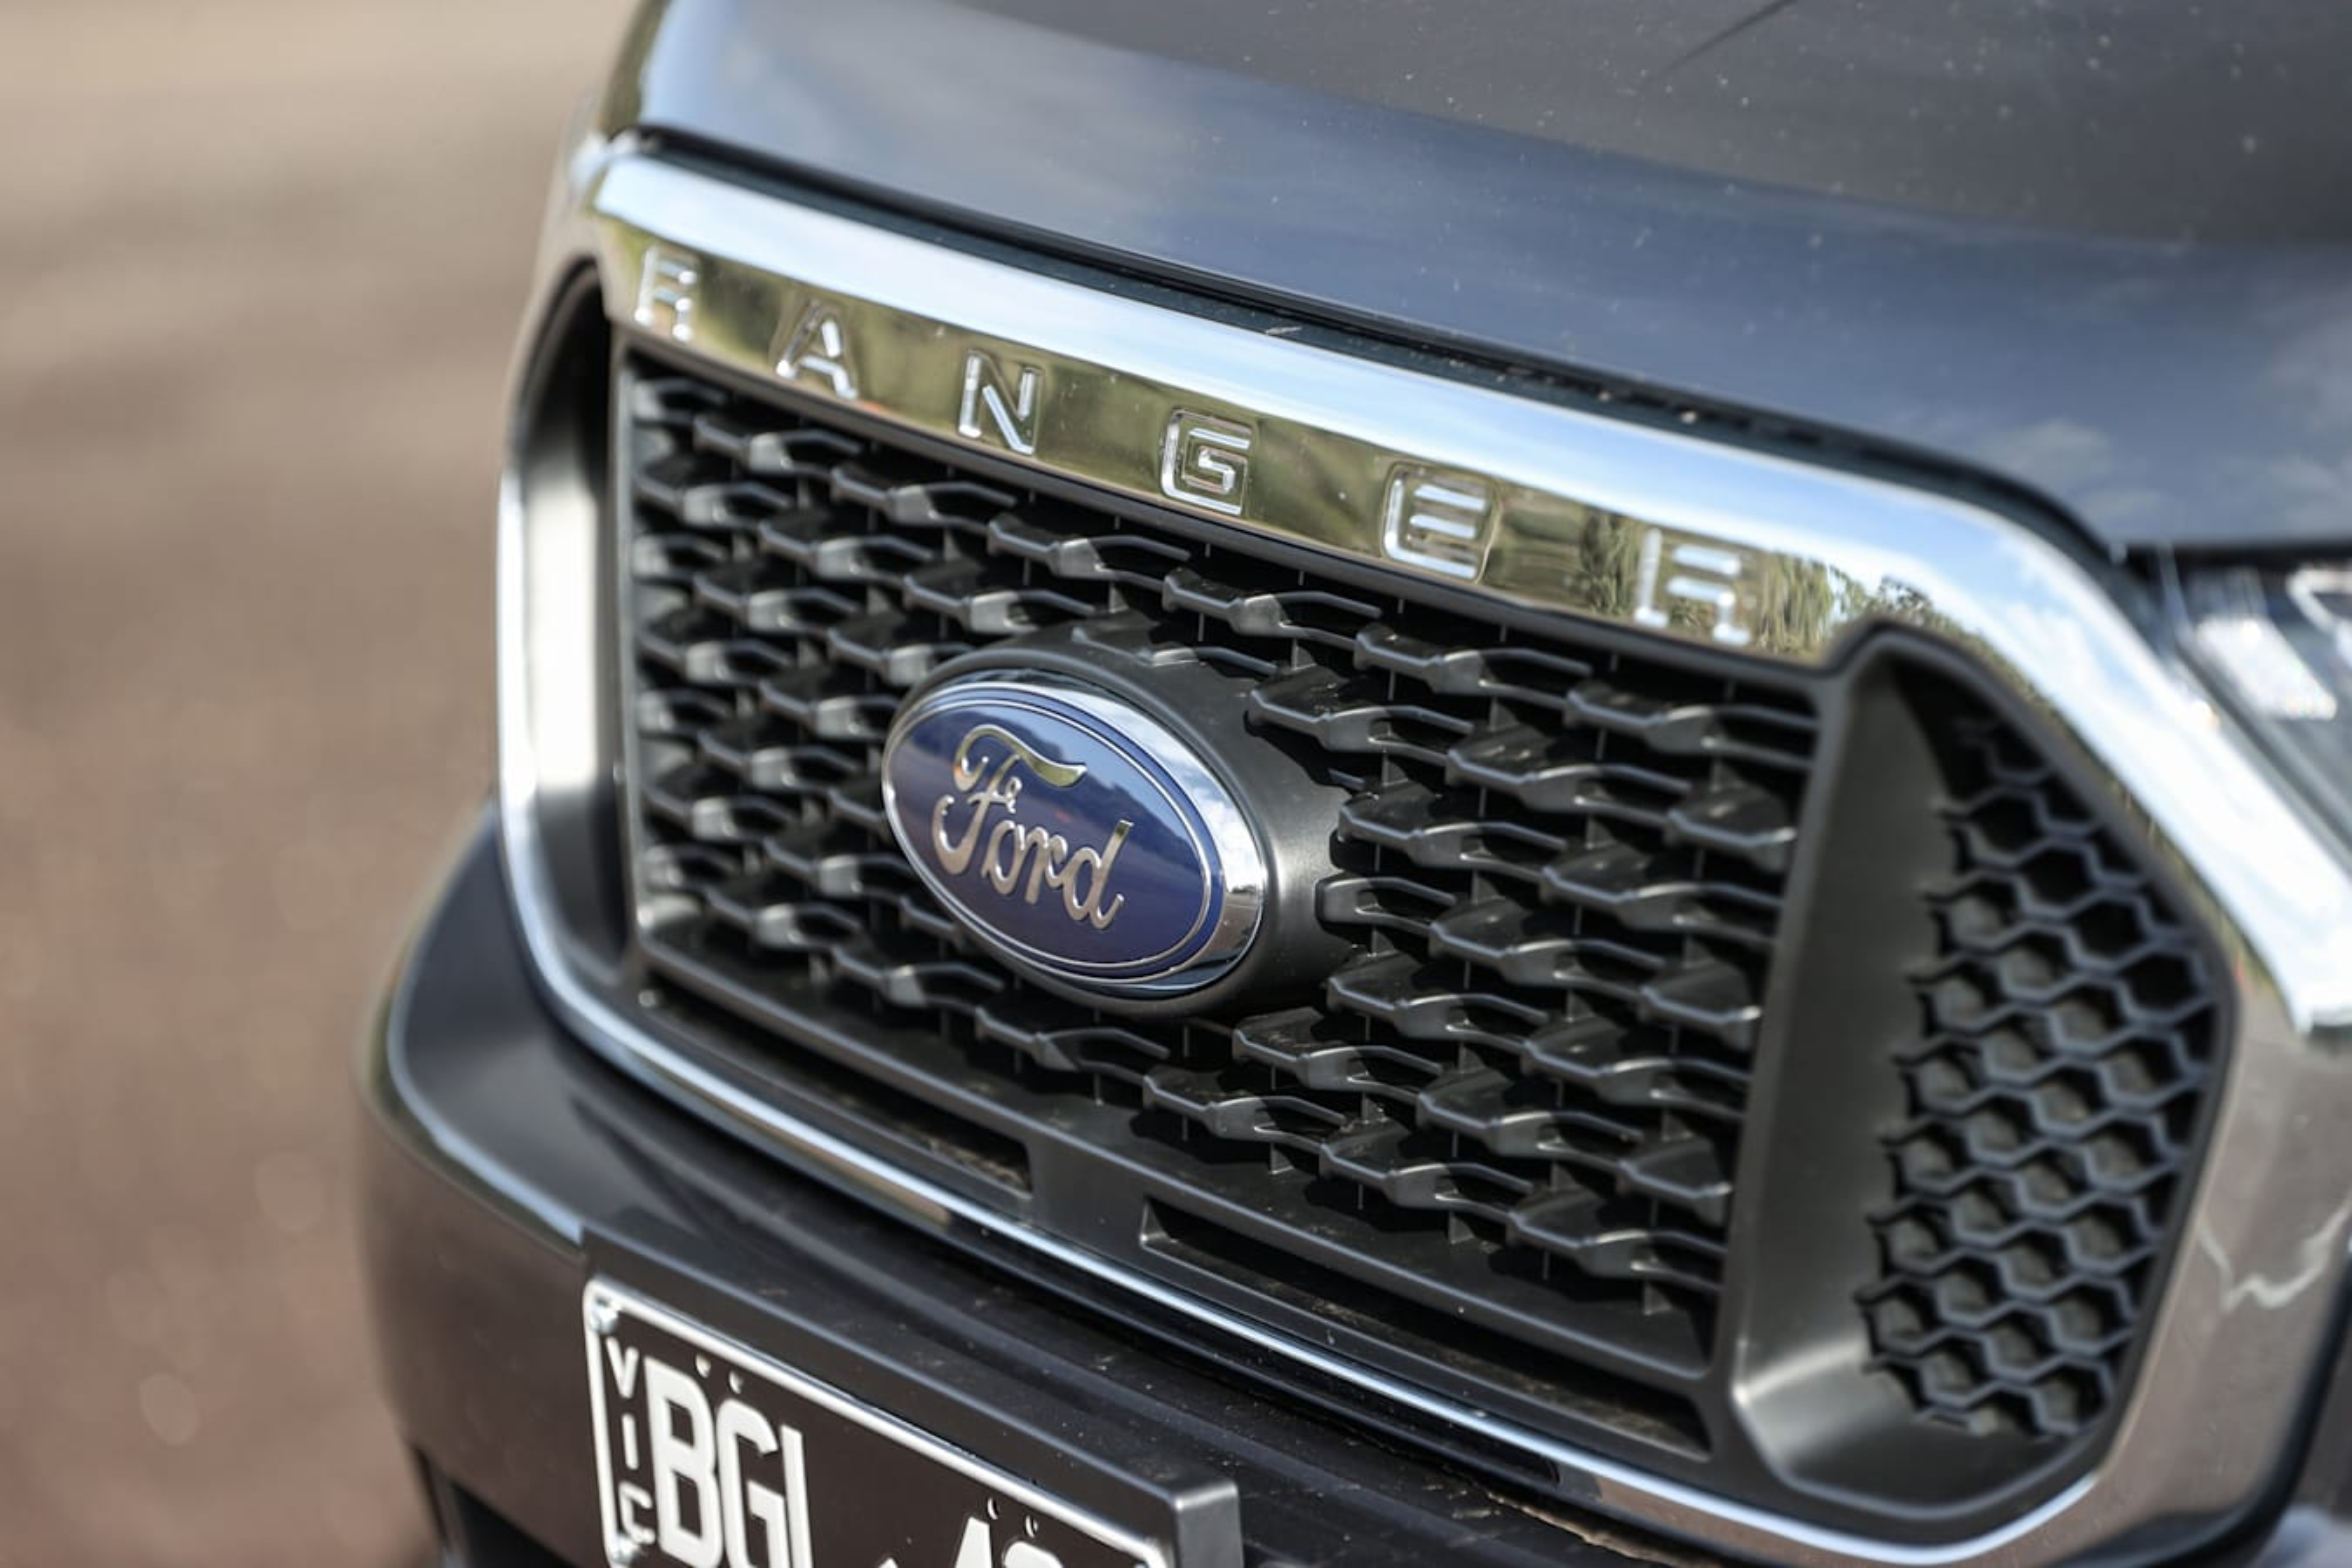 4 X 4 Australia Comparisons 2021 May 21 Ford Ranger XLT Badge Logo